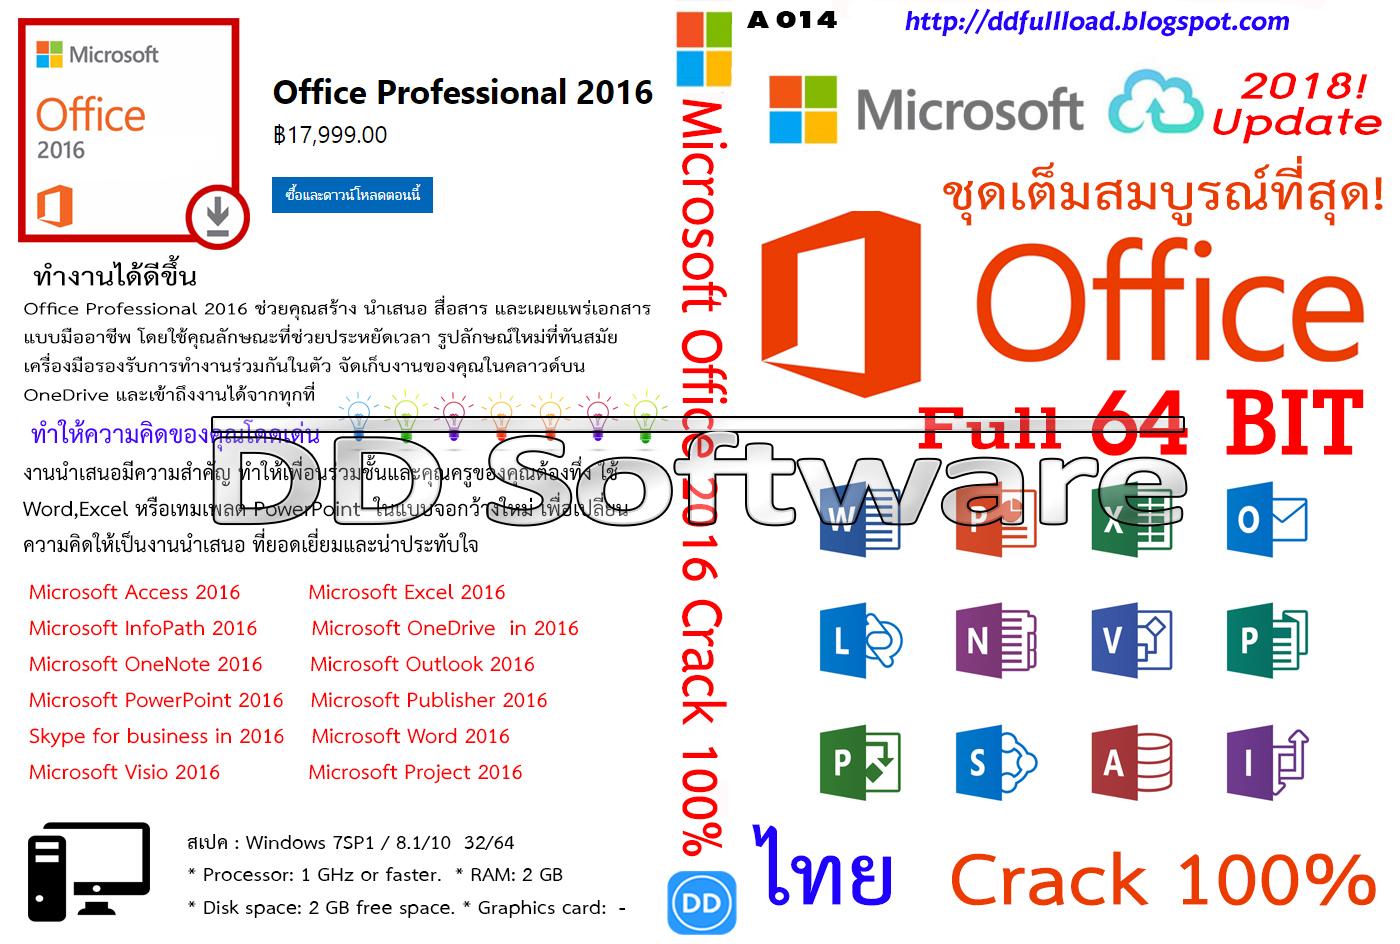 microsoft office 2016 crack 2018